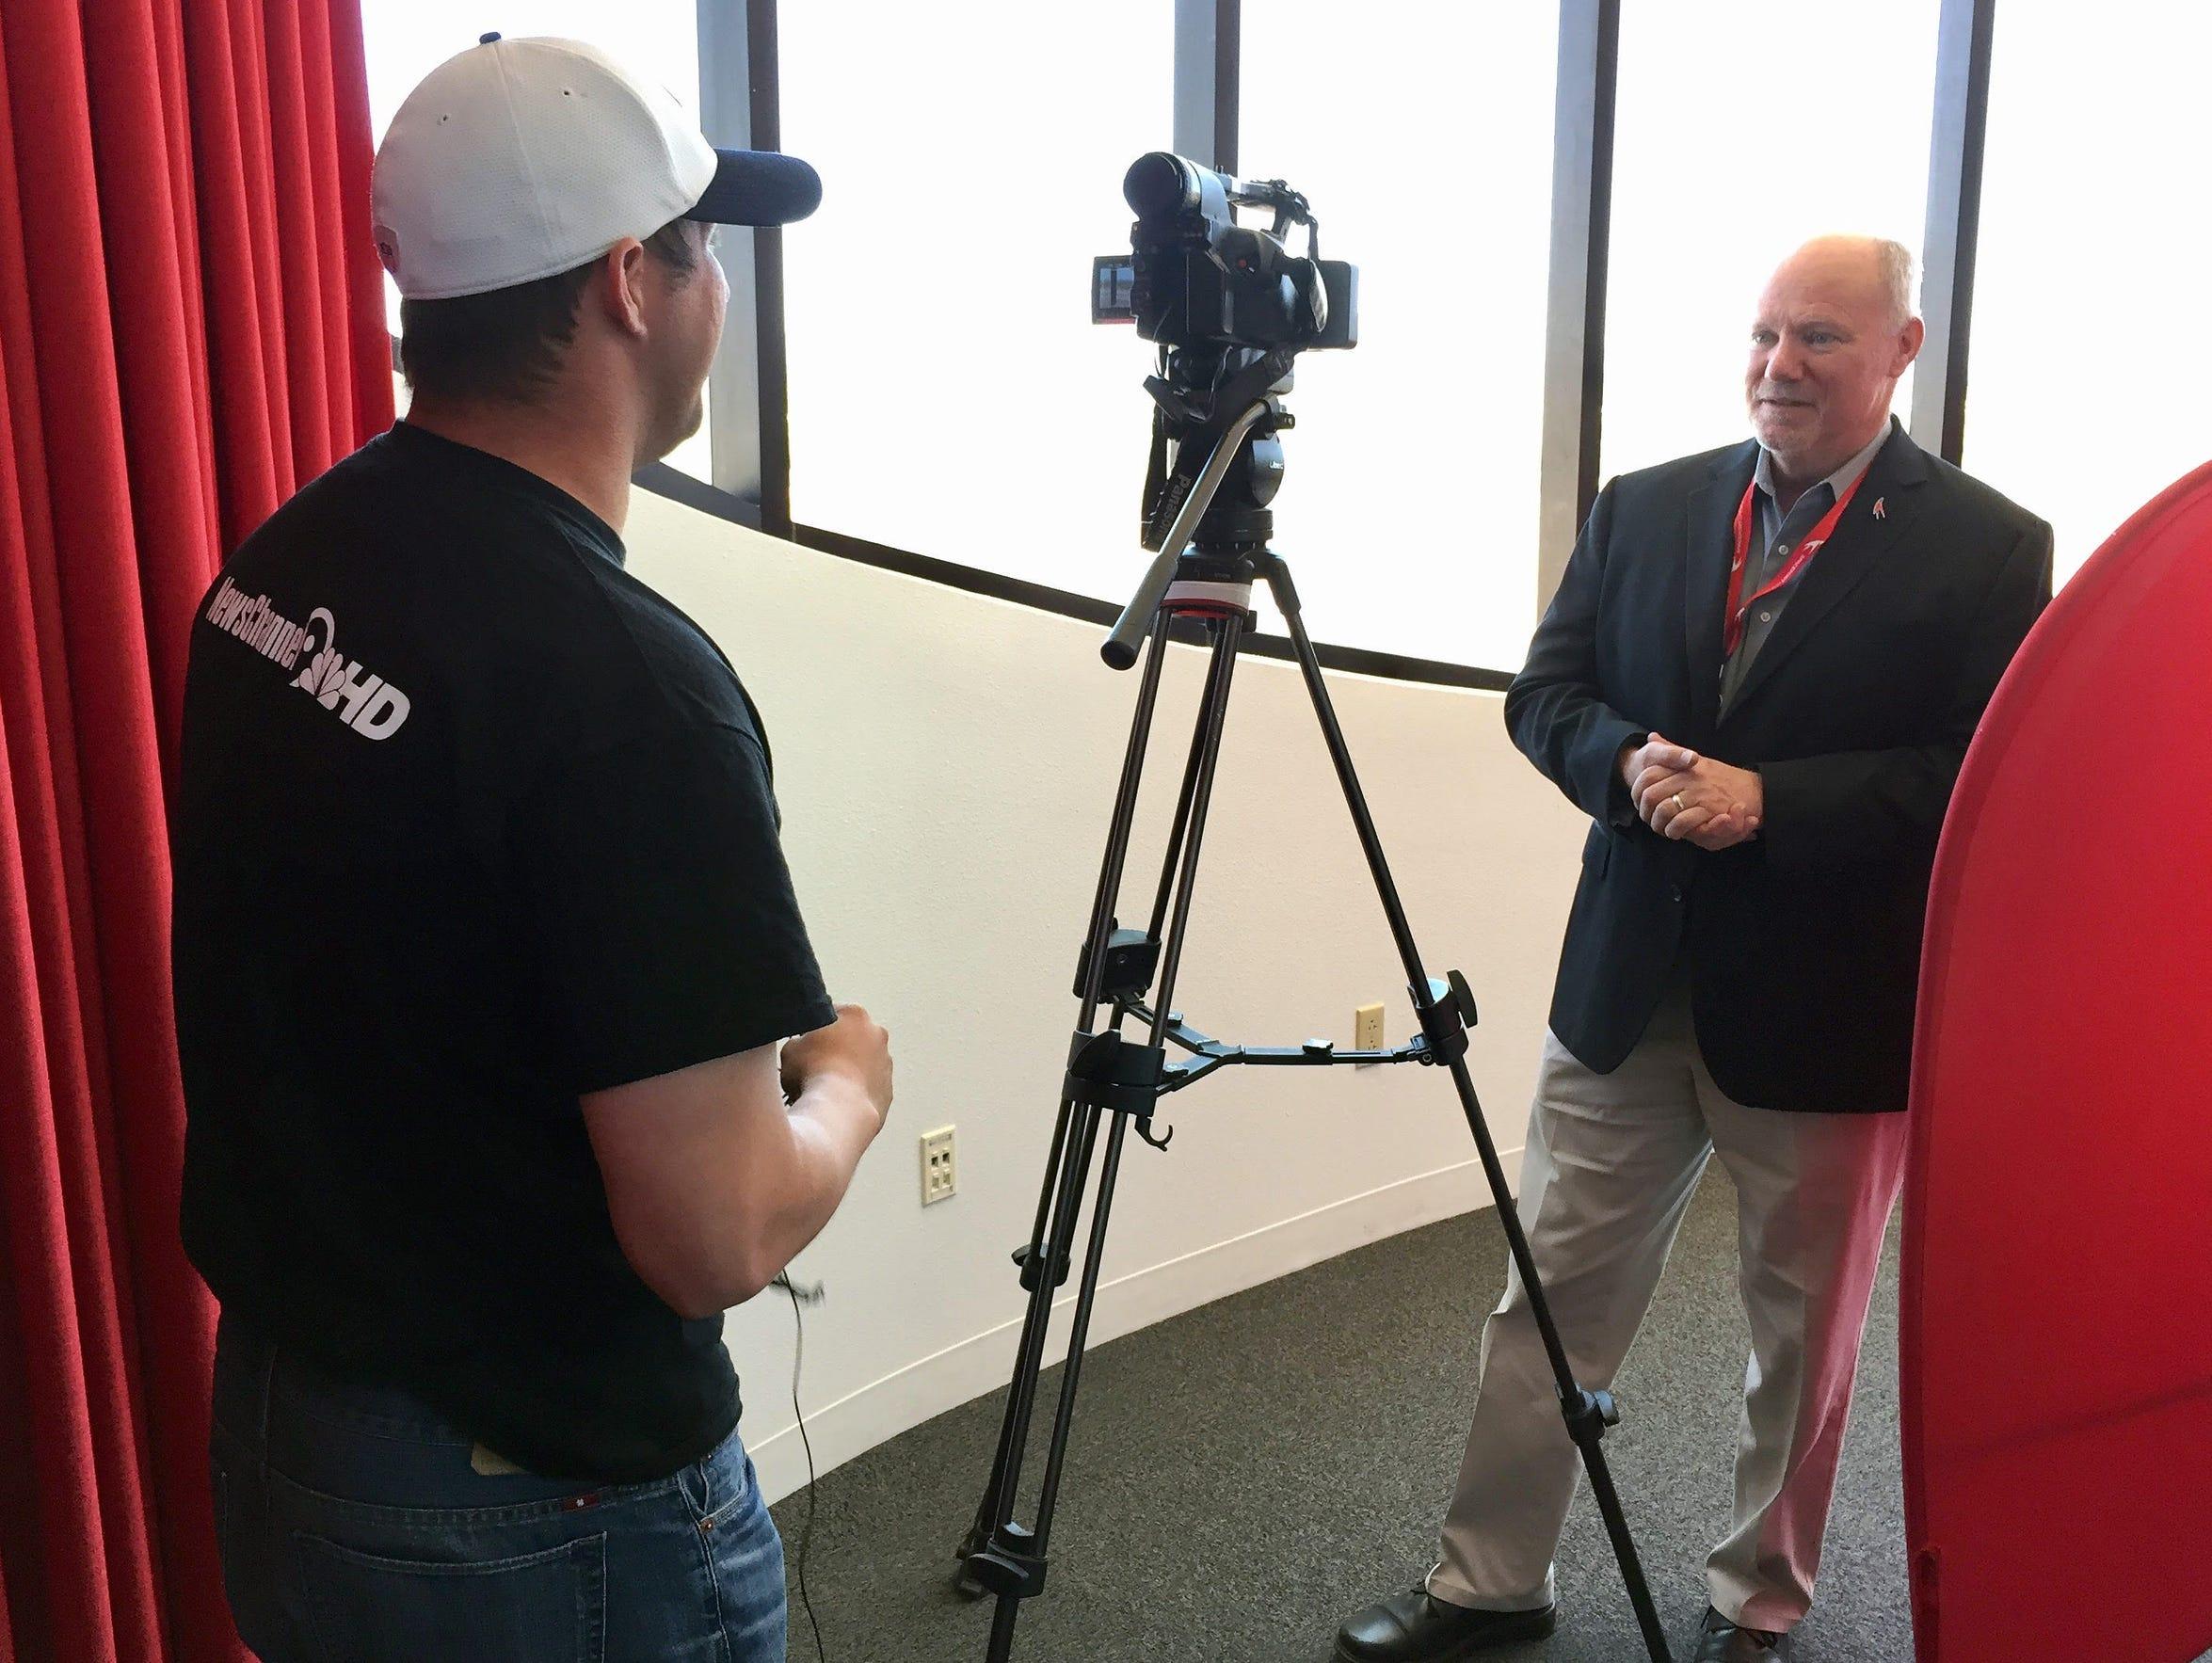 Patrick Hayes, a reporter with KTSM-TV in El Paso,